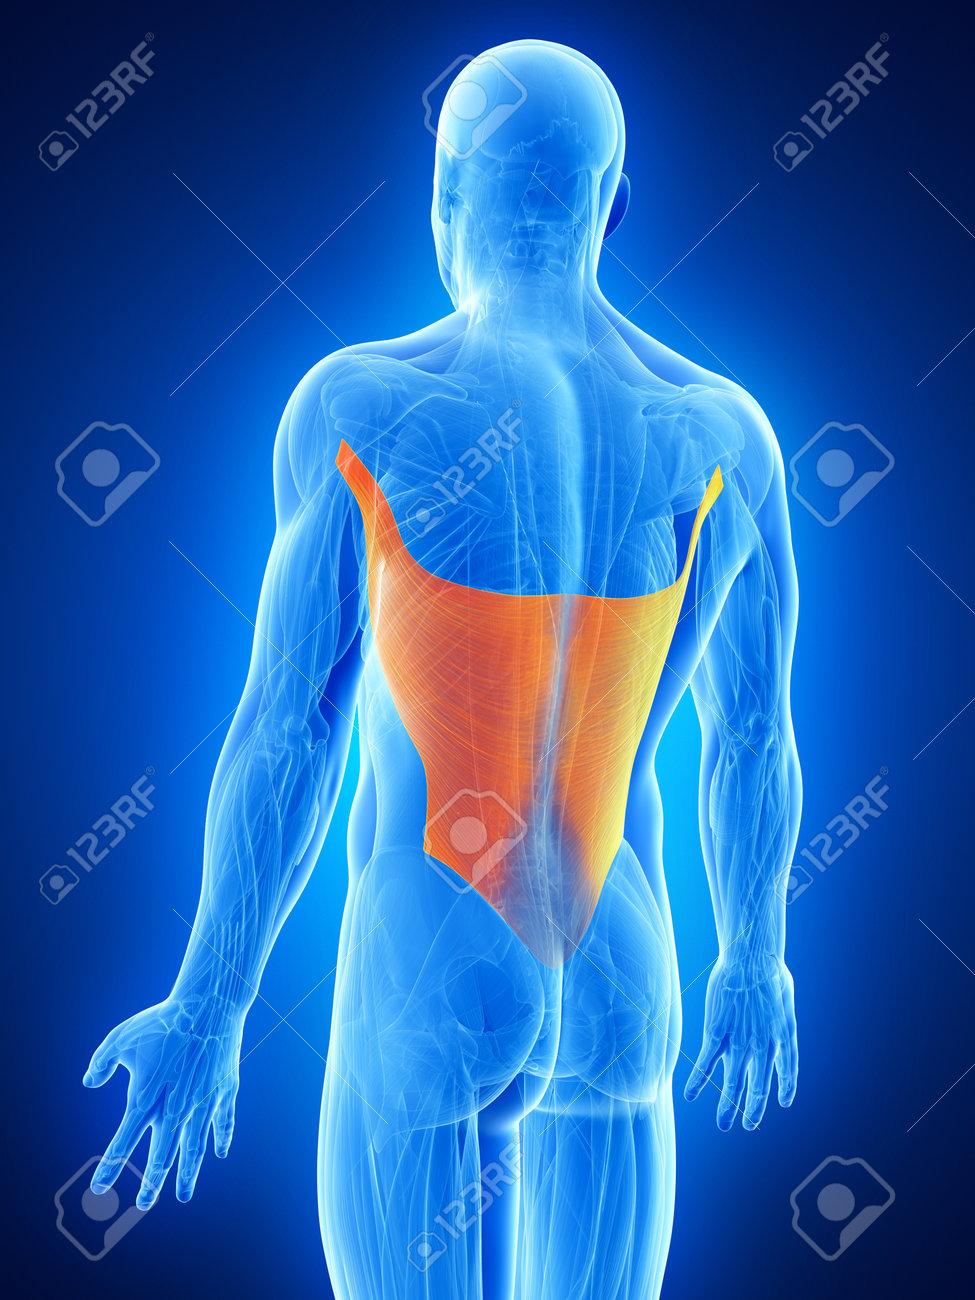 Anatomy Illustration Showing The Latissimus Dorsi Stock Photo ...